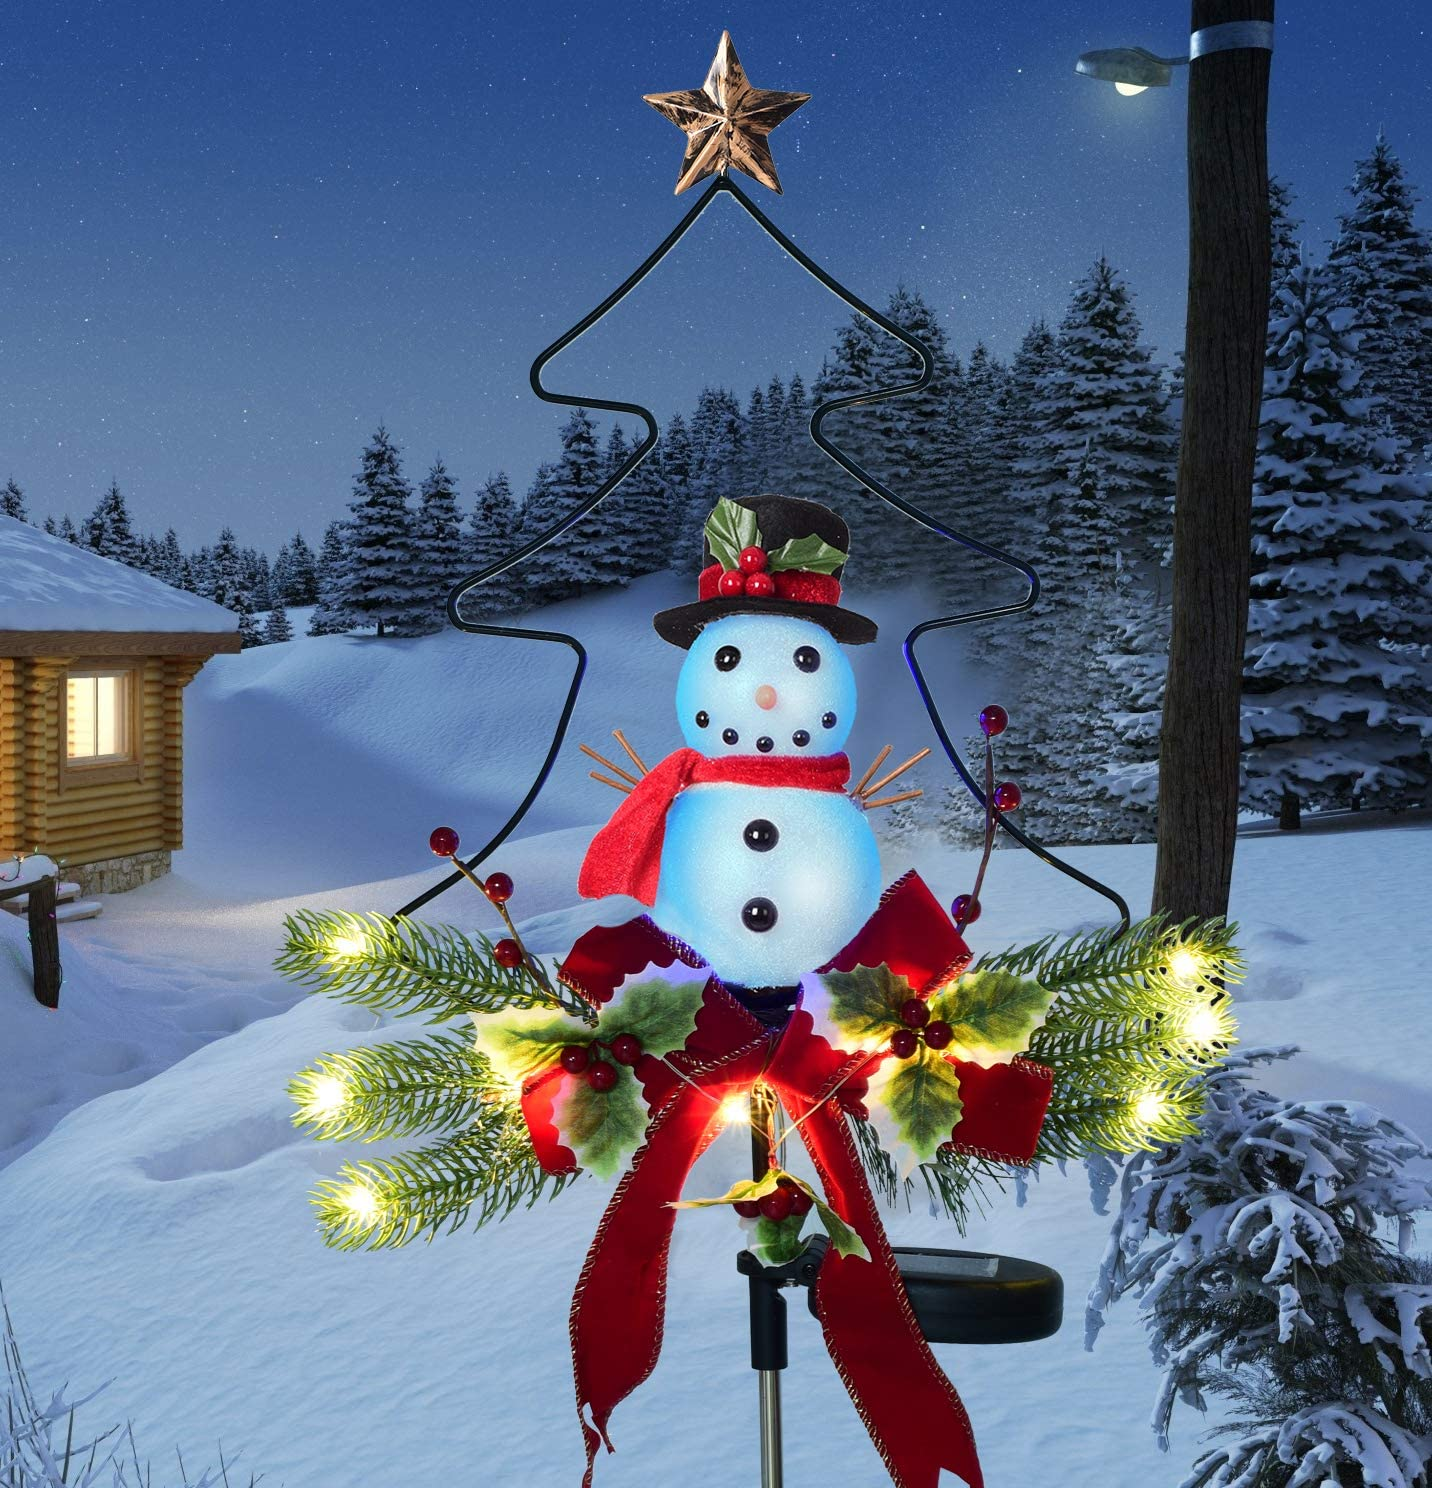 shop Doingart Outdoor New item Solar Light Christmas Chri Decorations Snowman